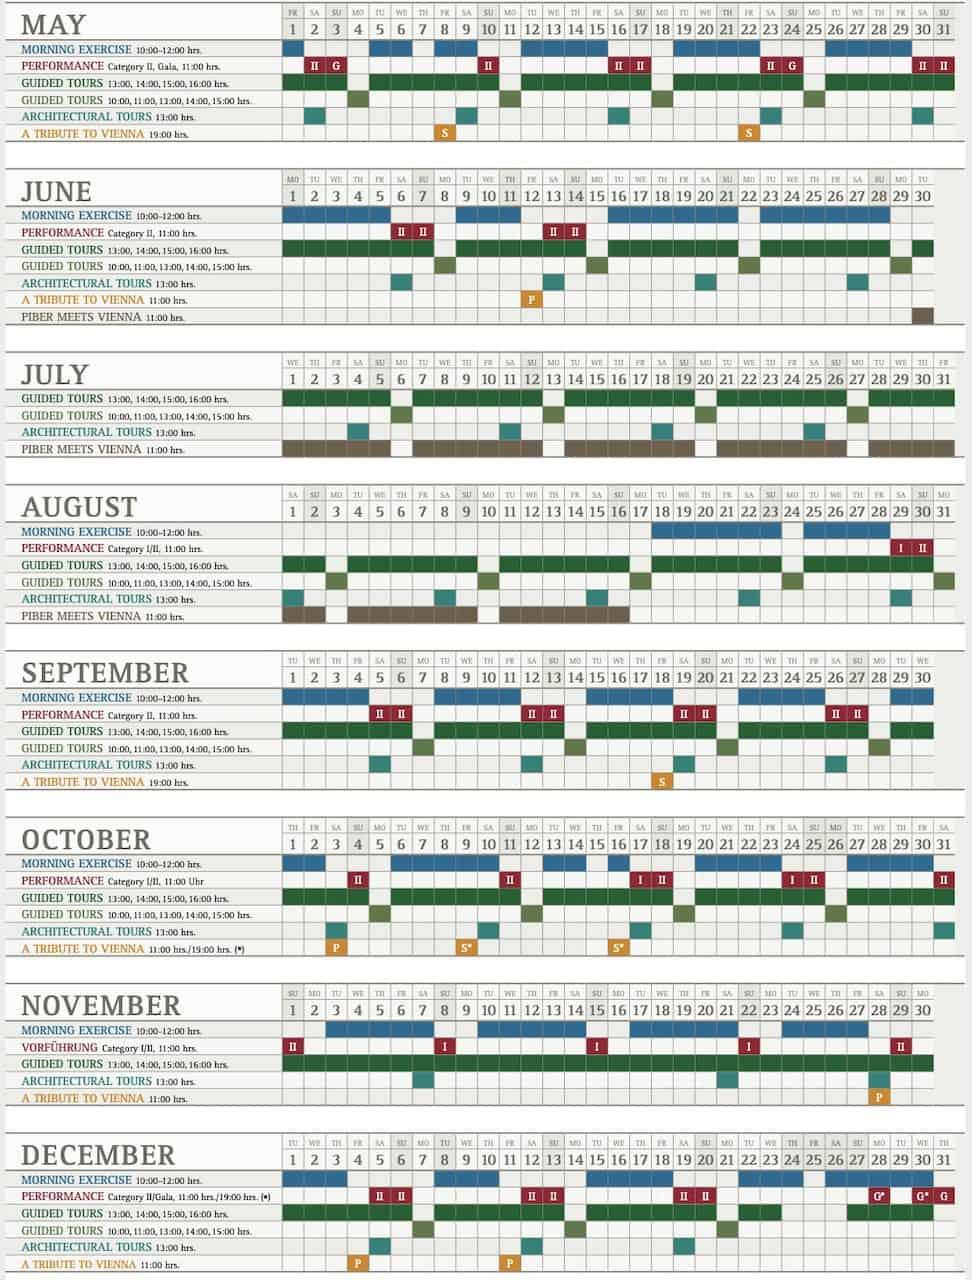 Spanish Riding School Schedule